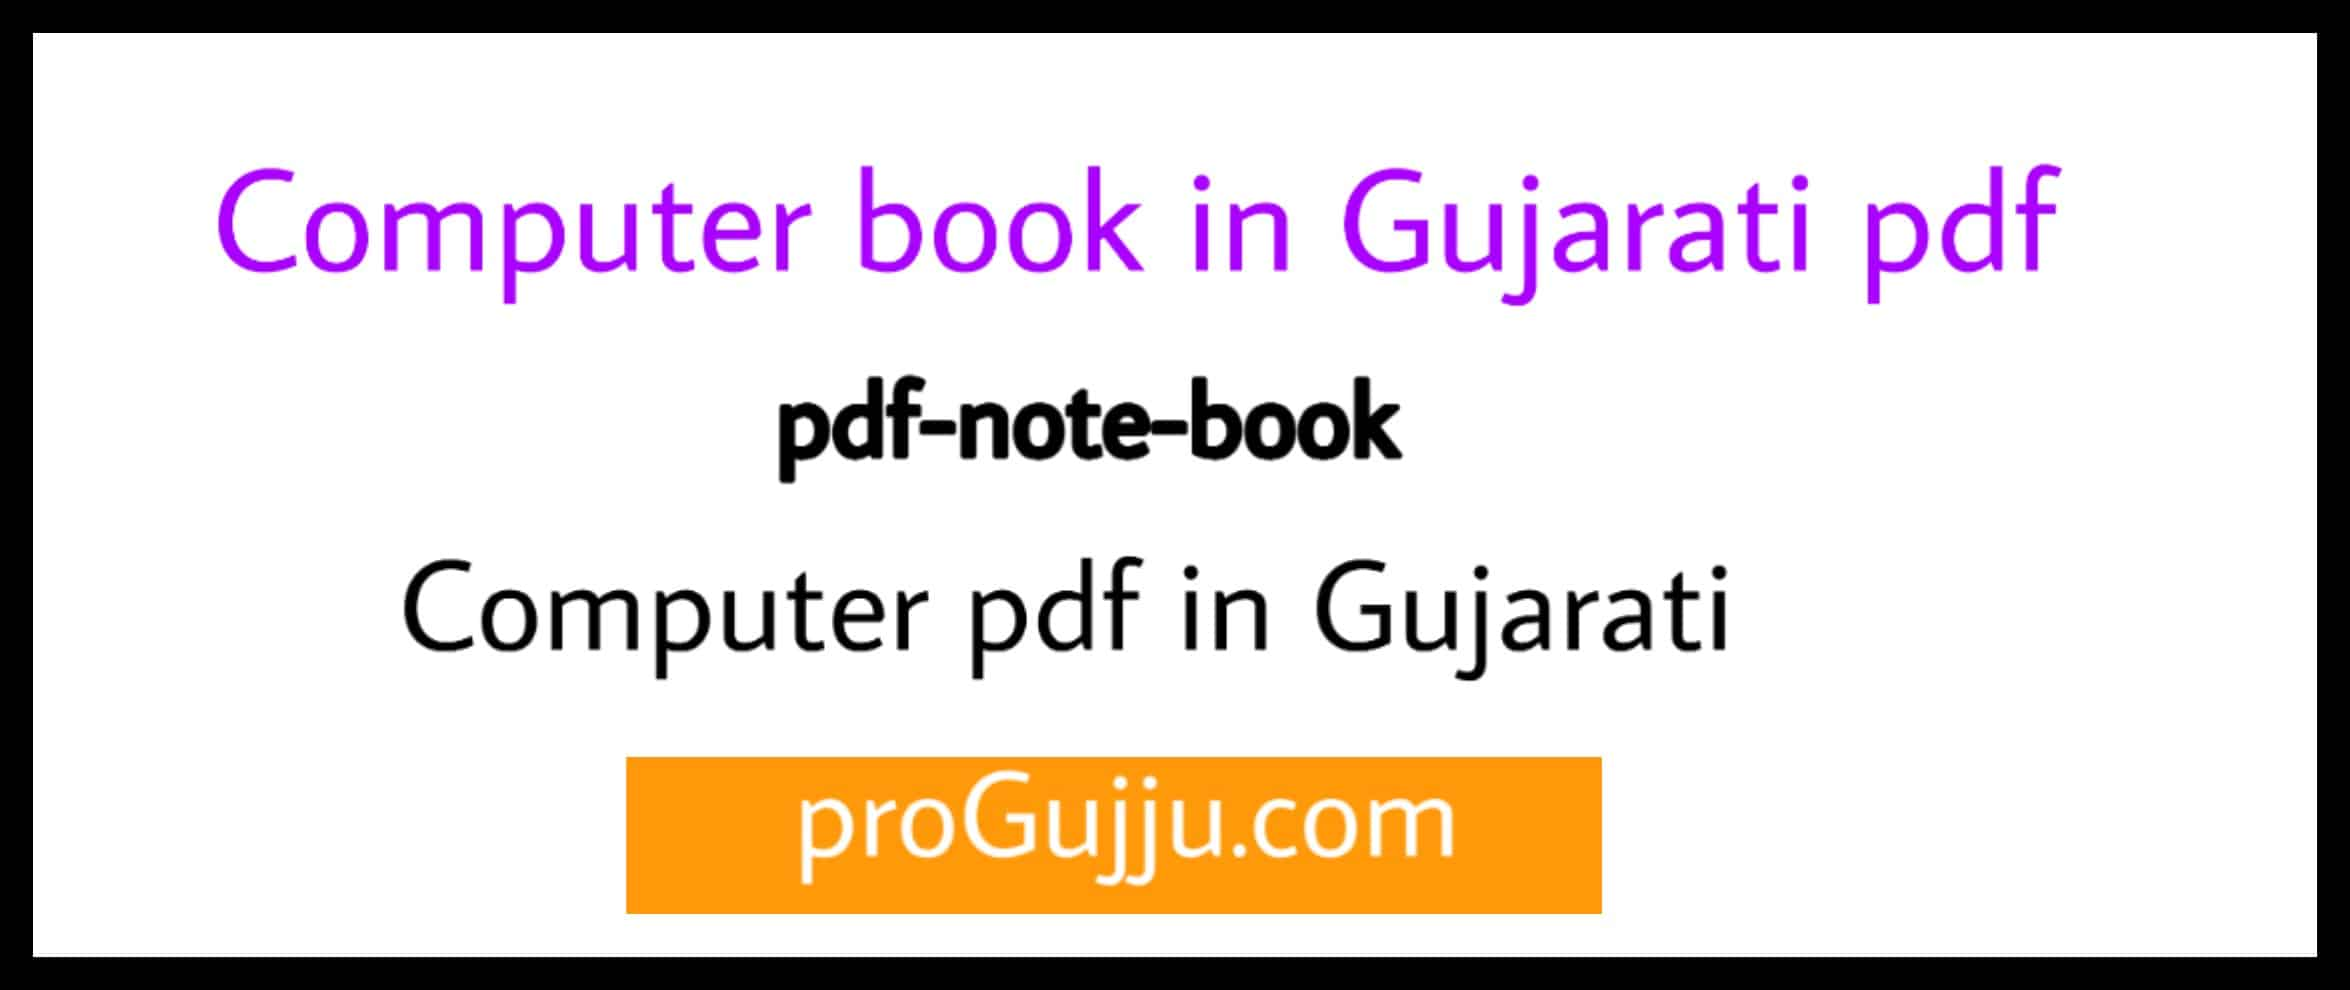 Computer pfd in Gujarati